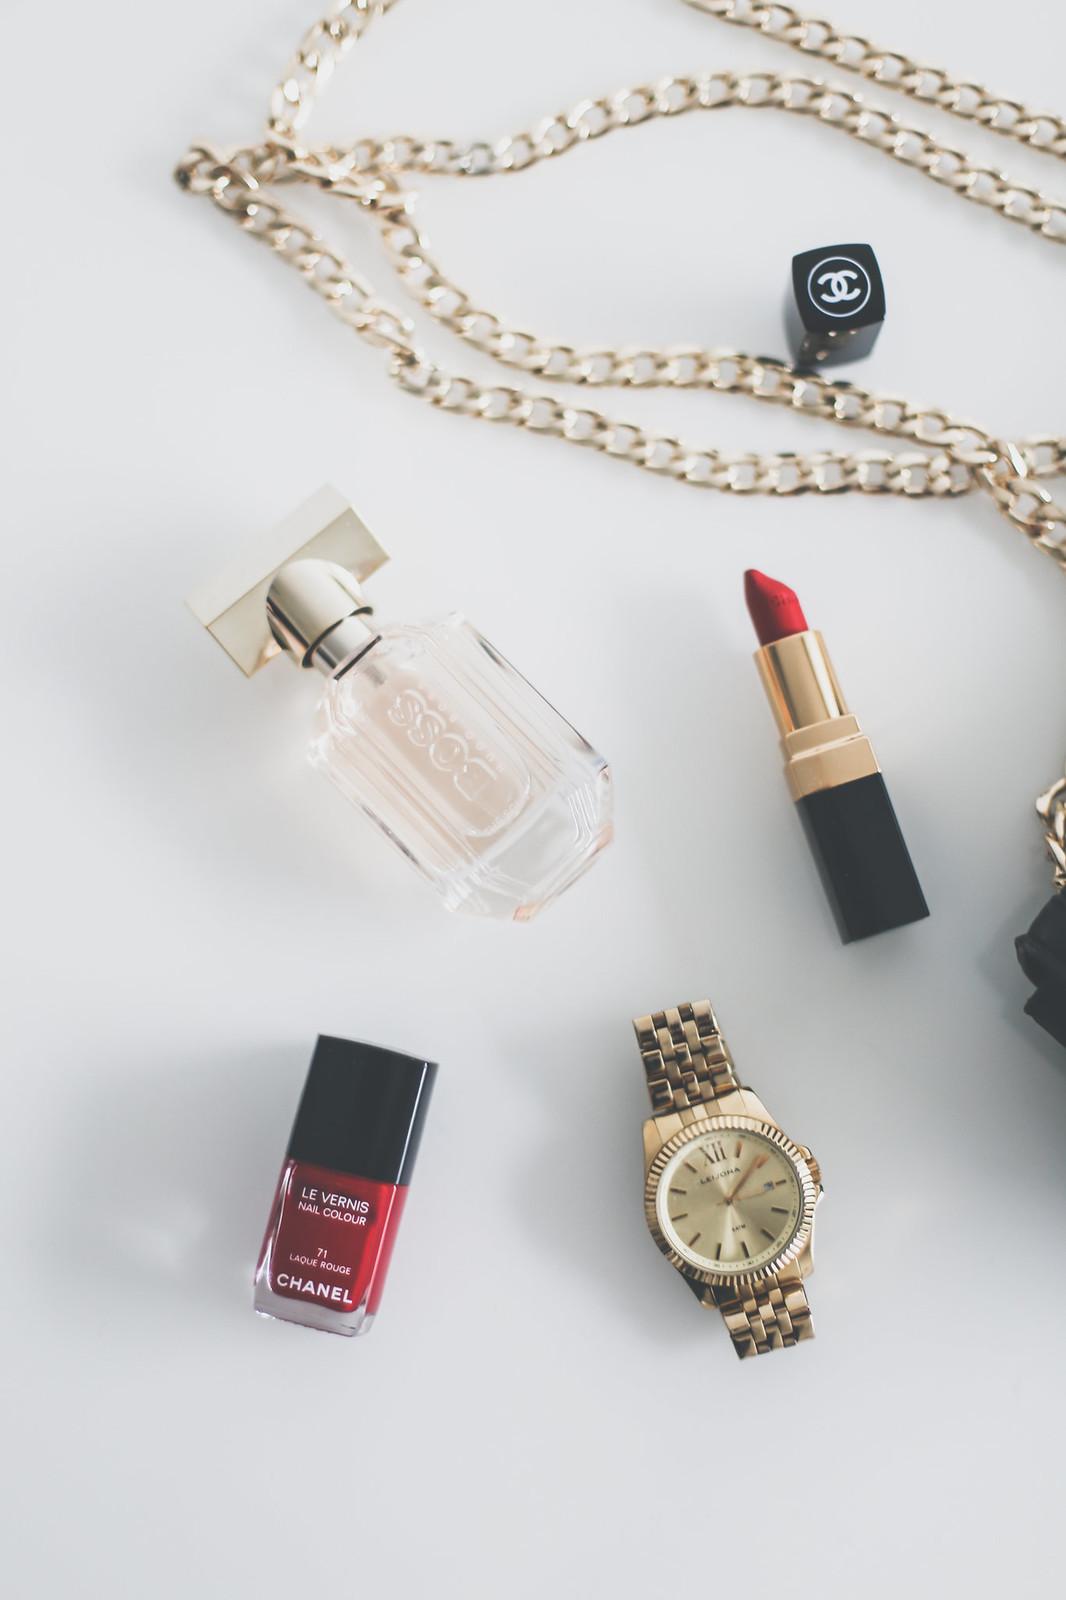 Dating Chanel haju vesien pullot